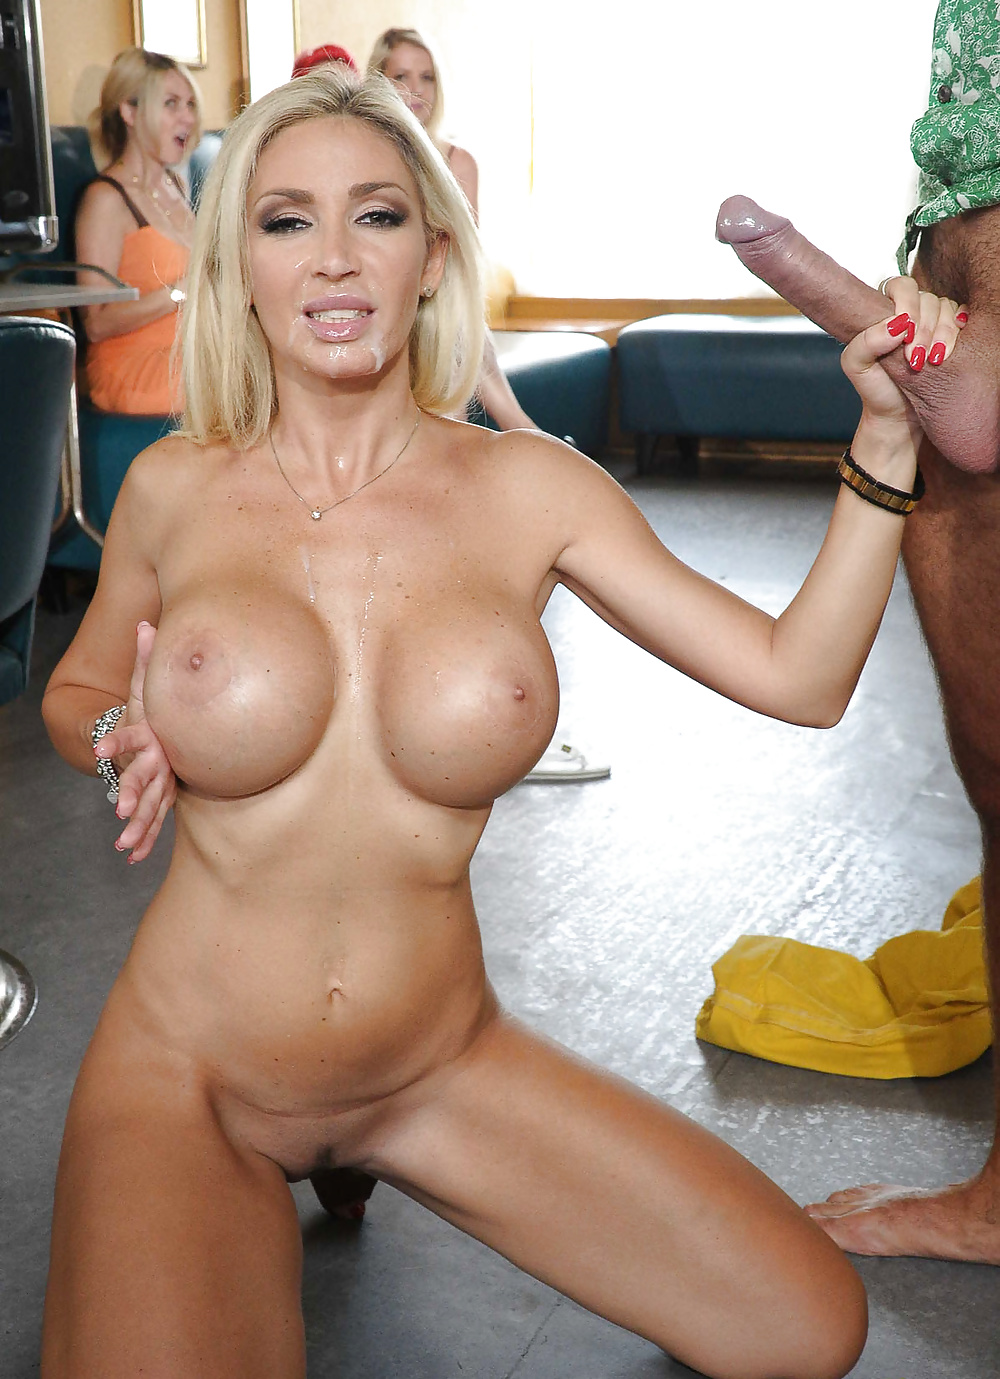 Fake tits porn